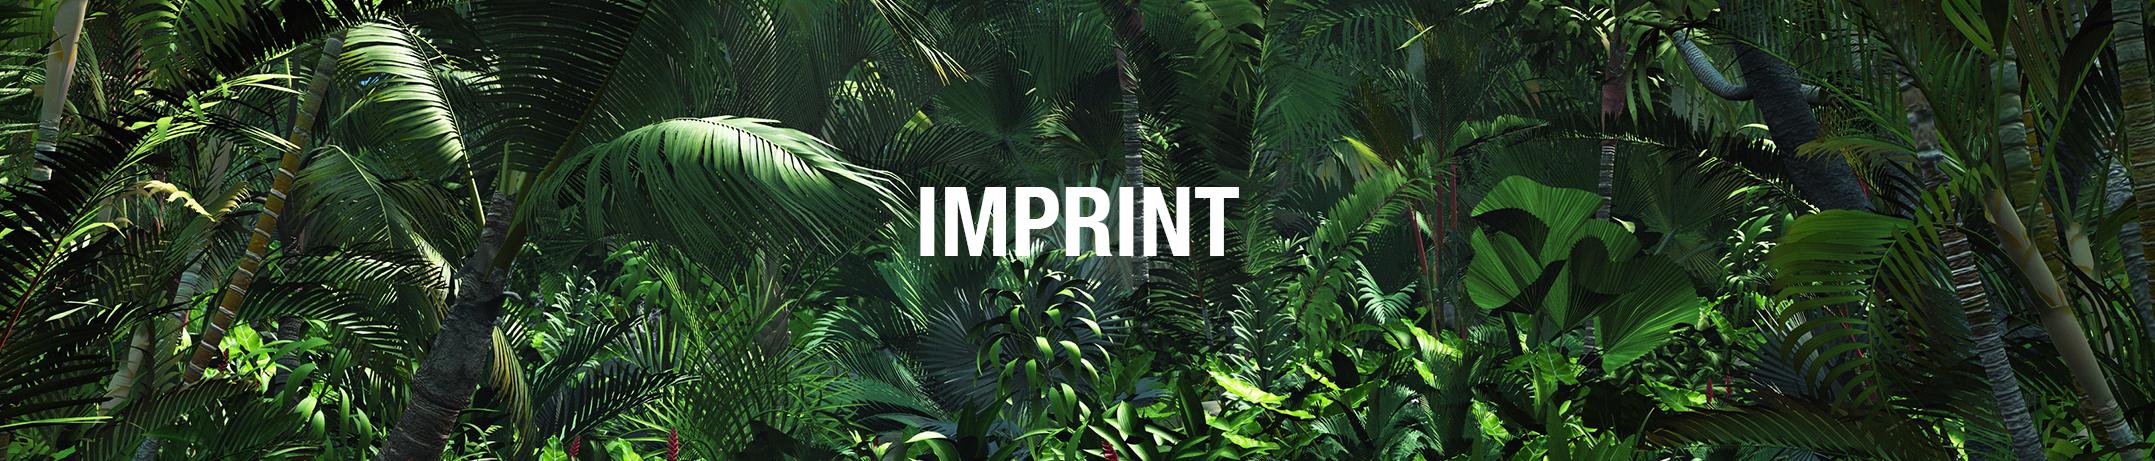 IMPRINT MALUNE